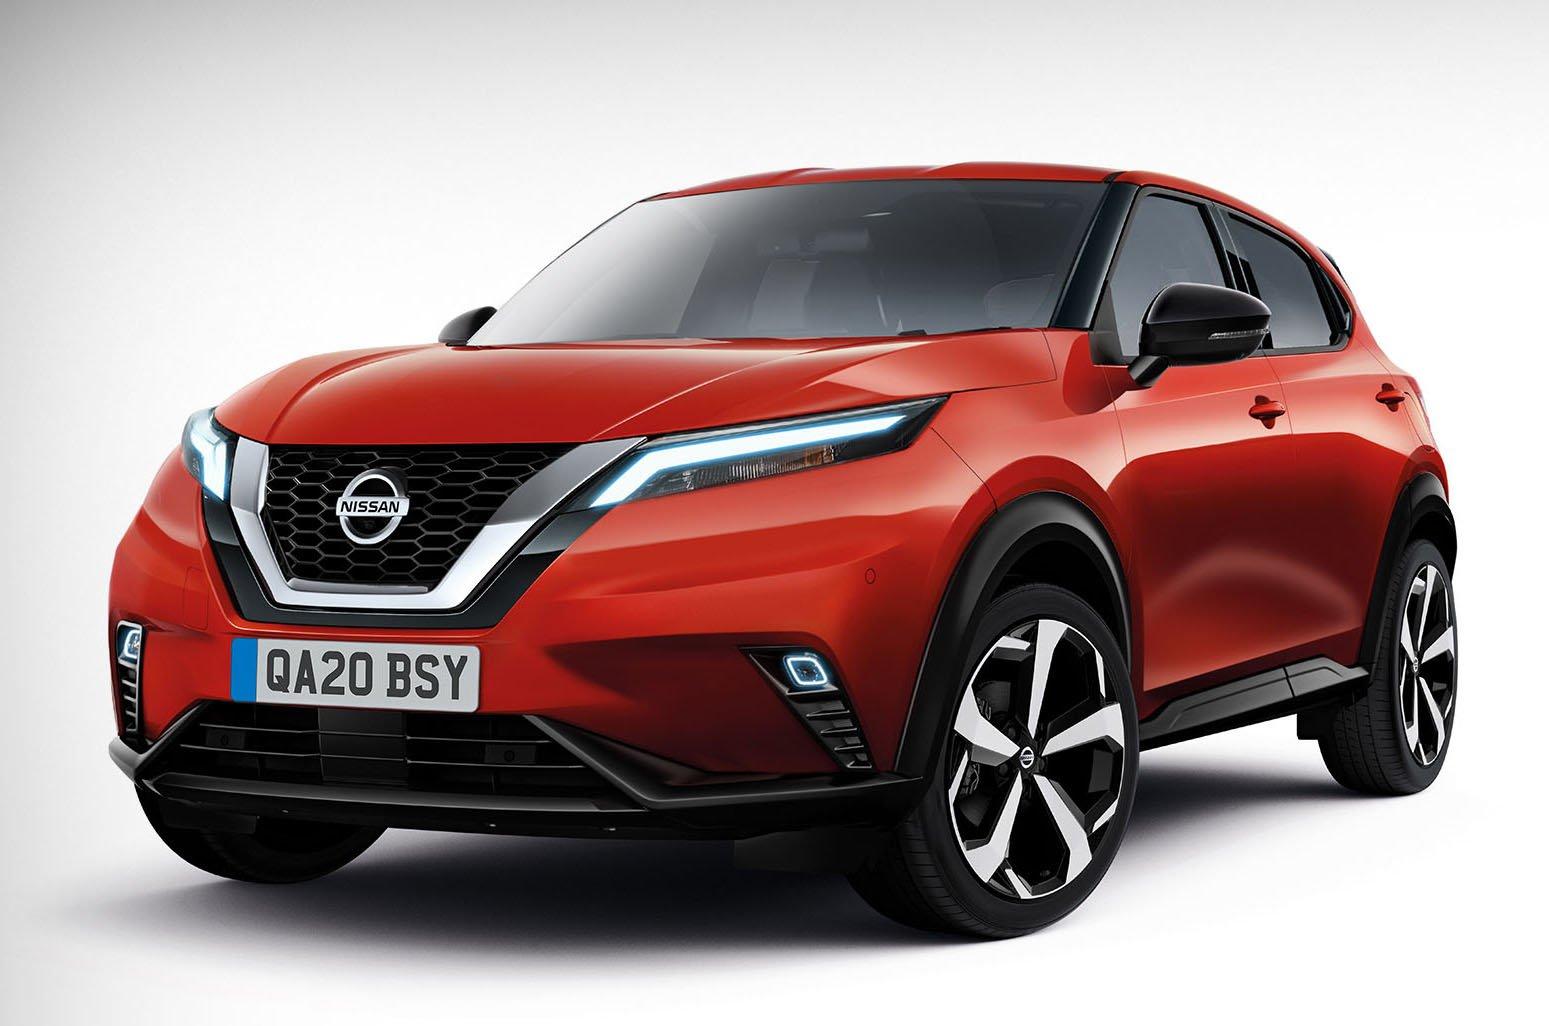 2020 Nissan Qashqai rendering